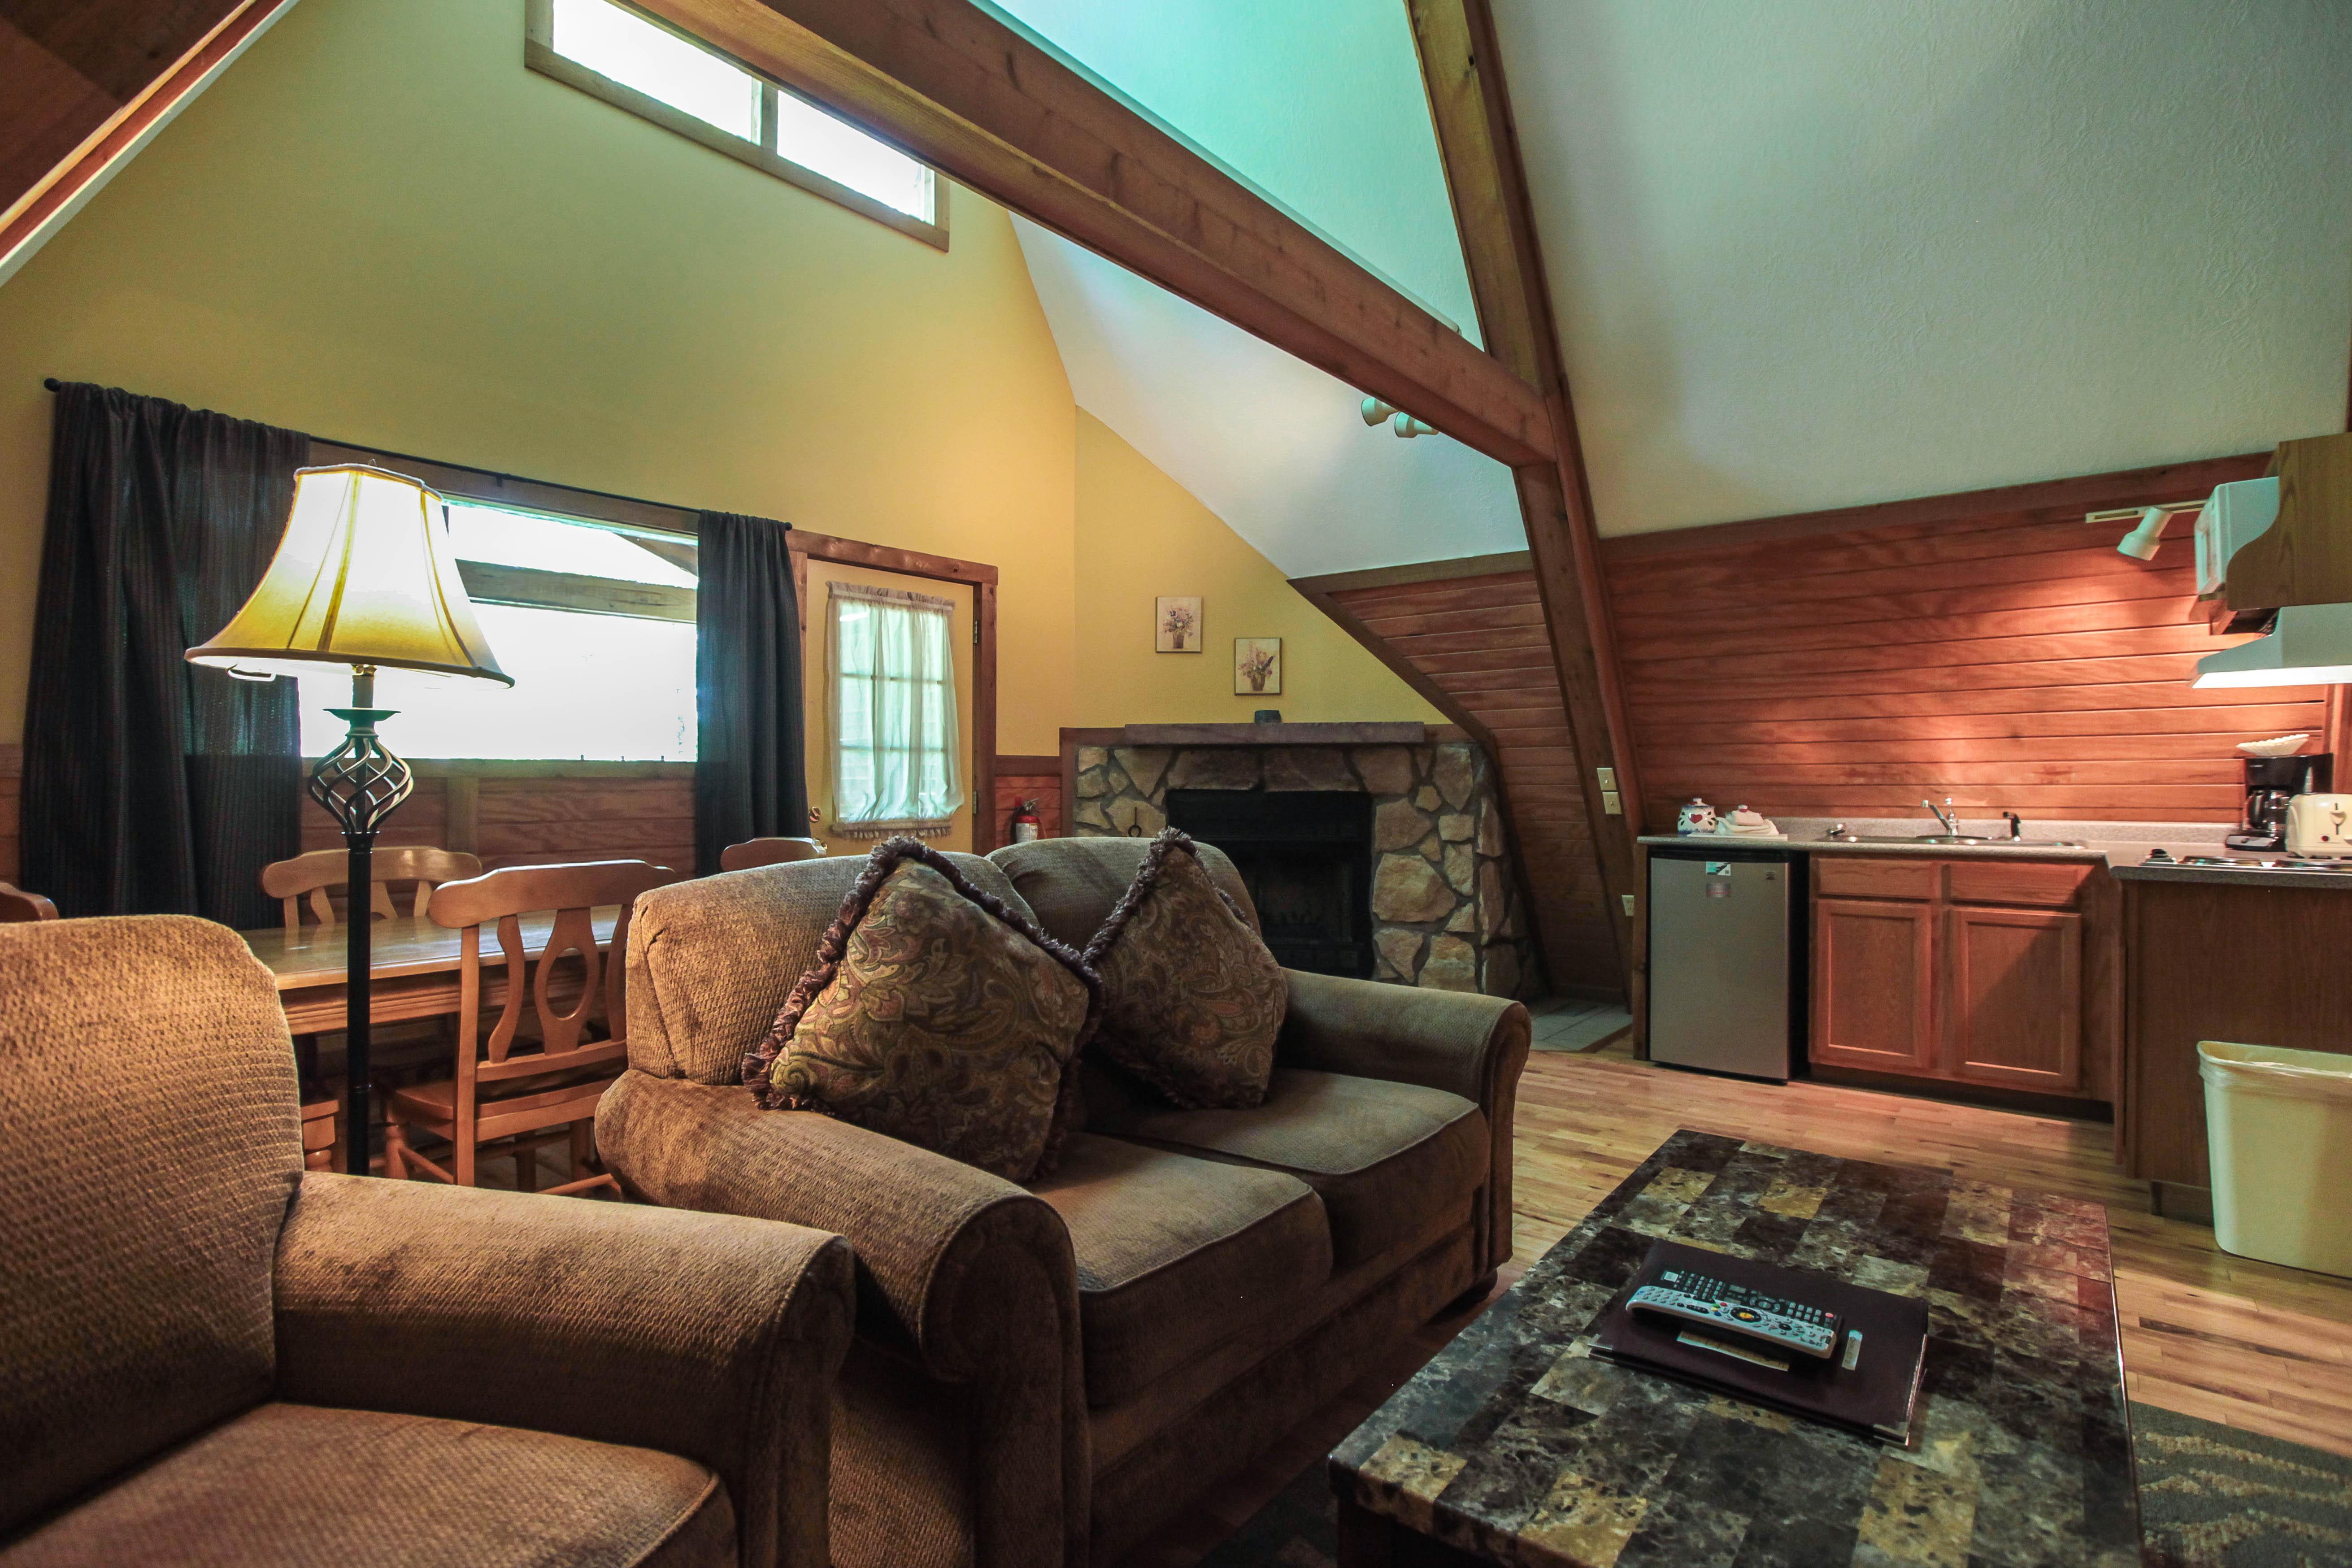 cabins and wahoo of ldg for gatlinburg ext city in sc log night cabin getaways sale romantic tn ohio homes